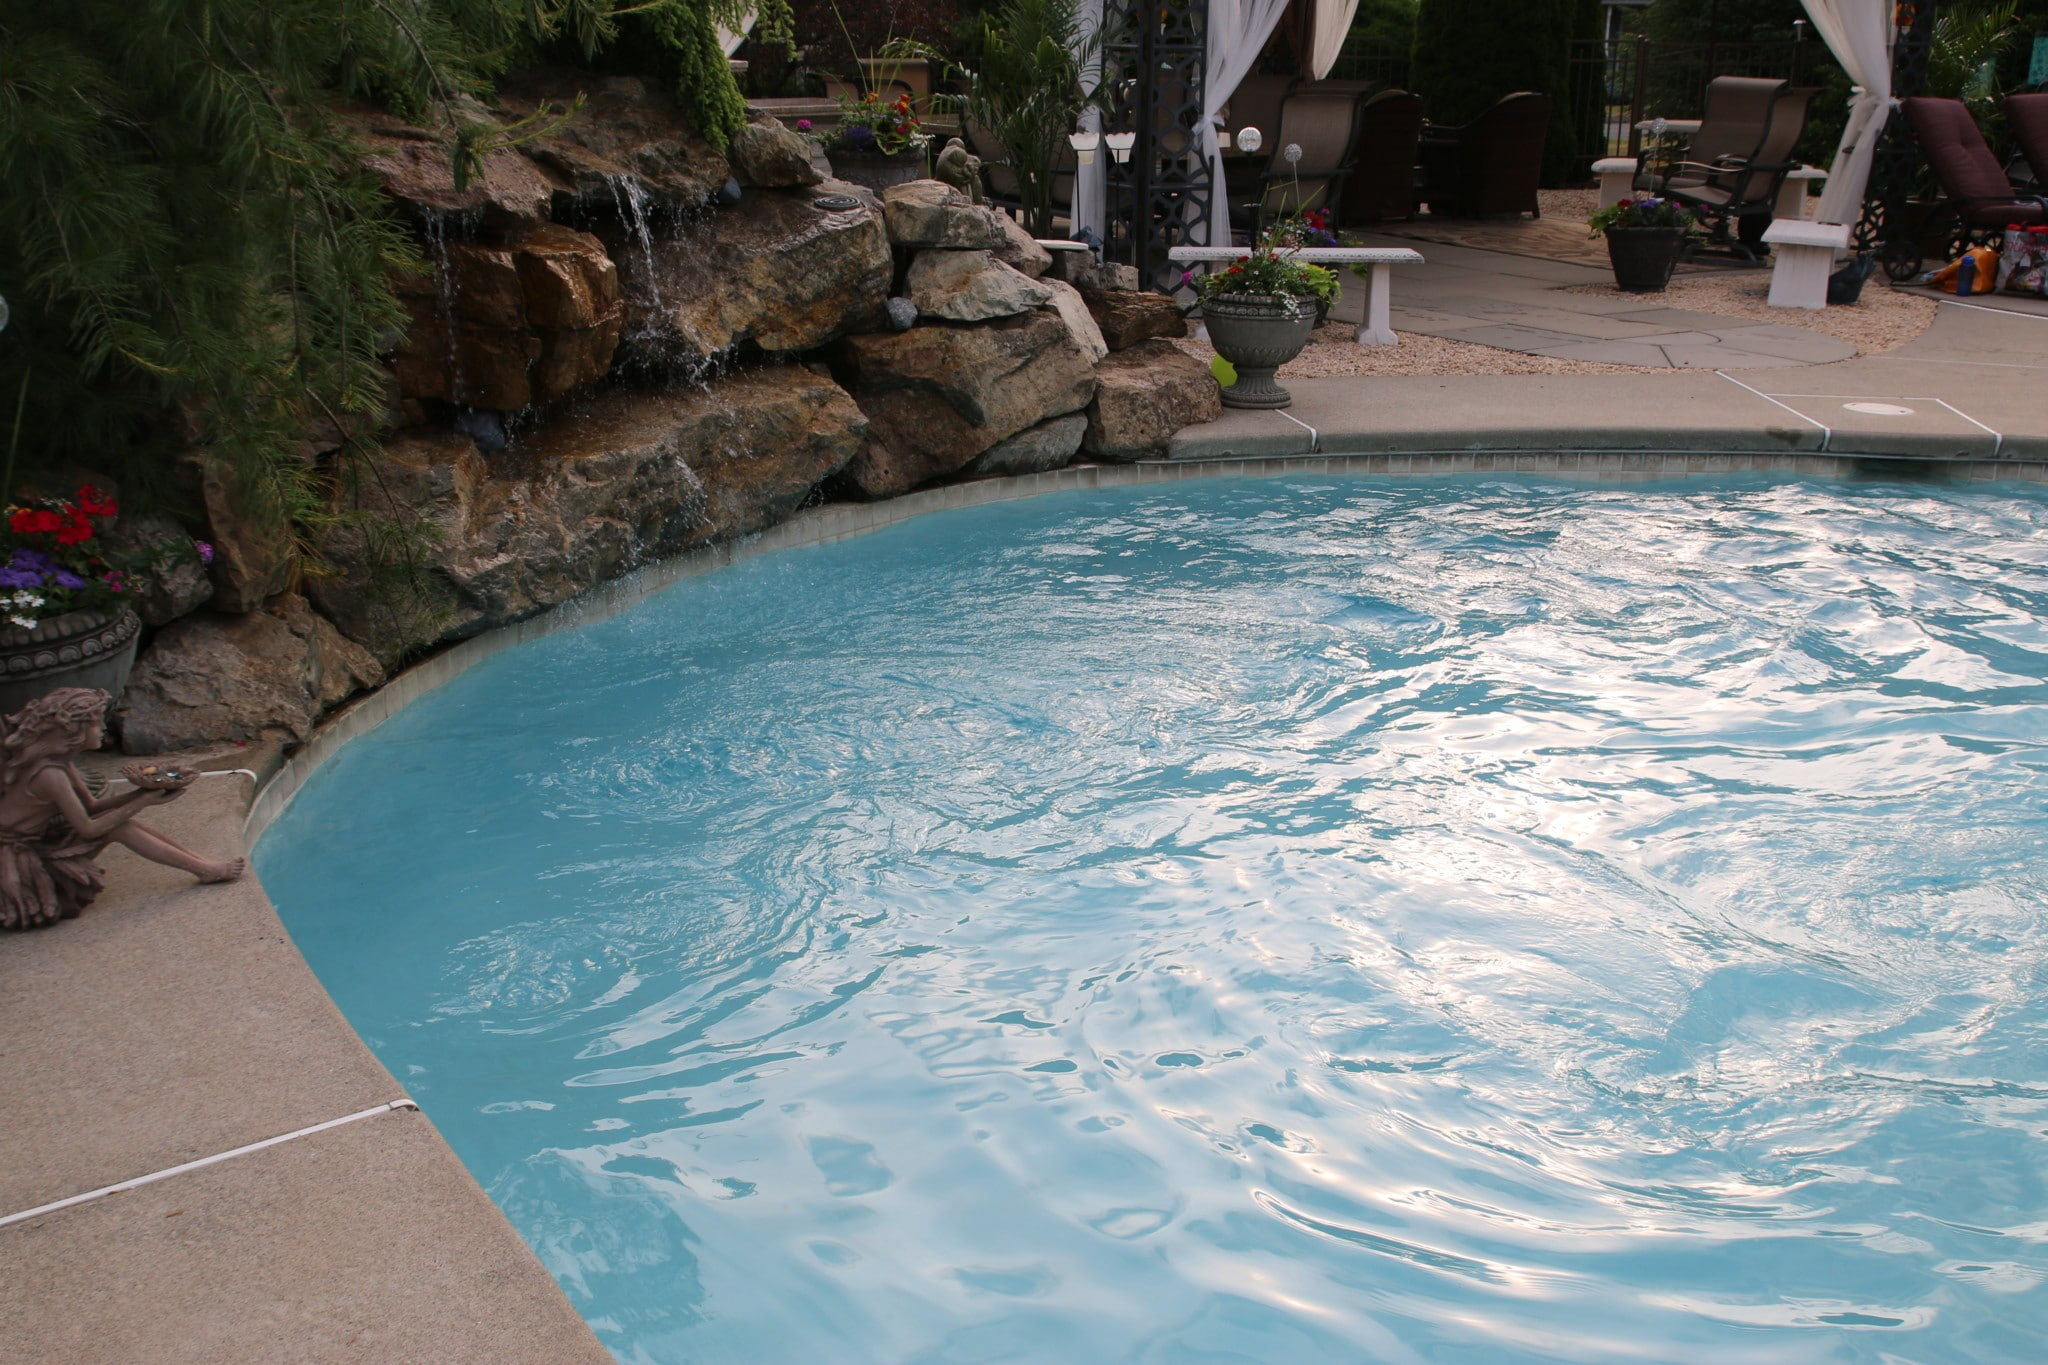 Swimming Pool Finish Line : Img coronado s pool renovations inc